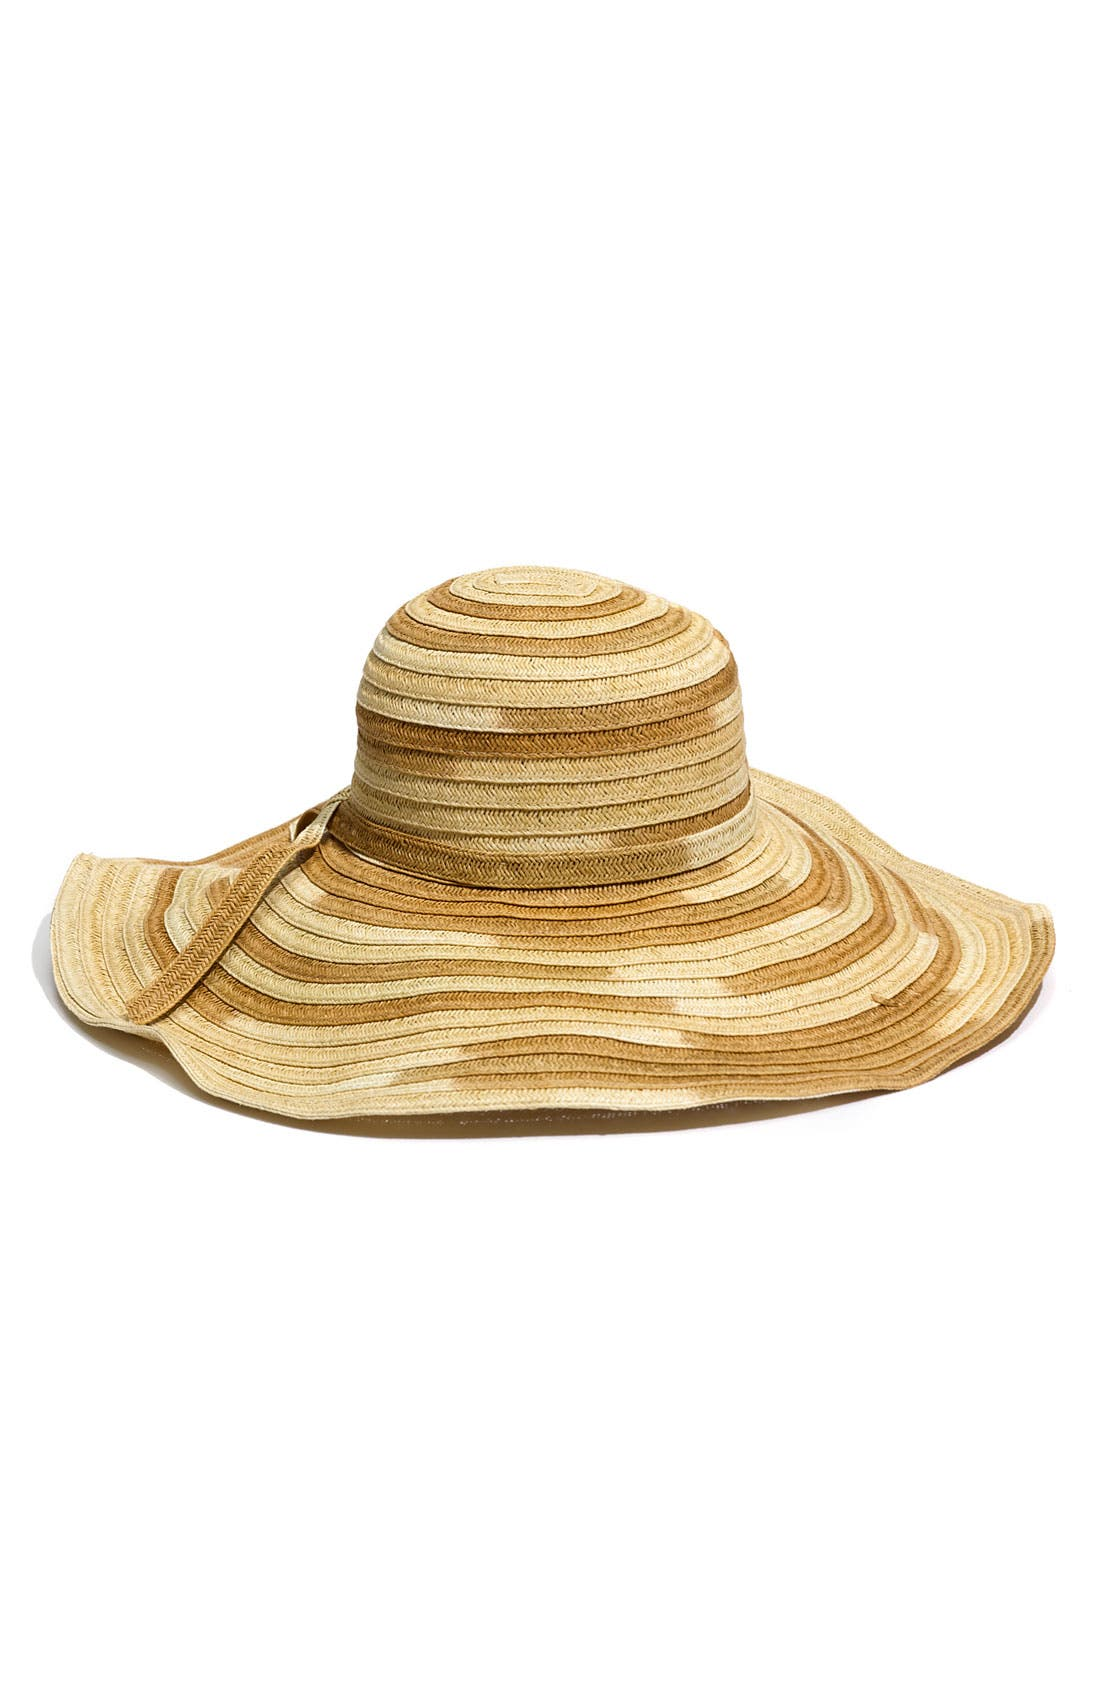 Alternate Image 1 Selected - Jessica Simpson 'Oversized' Ombré Hat